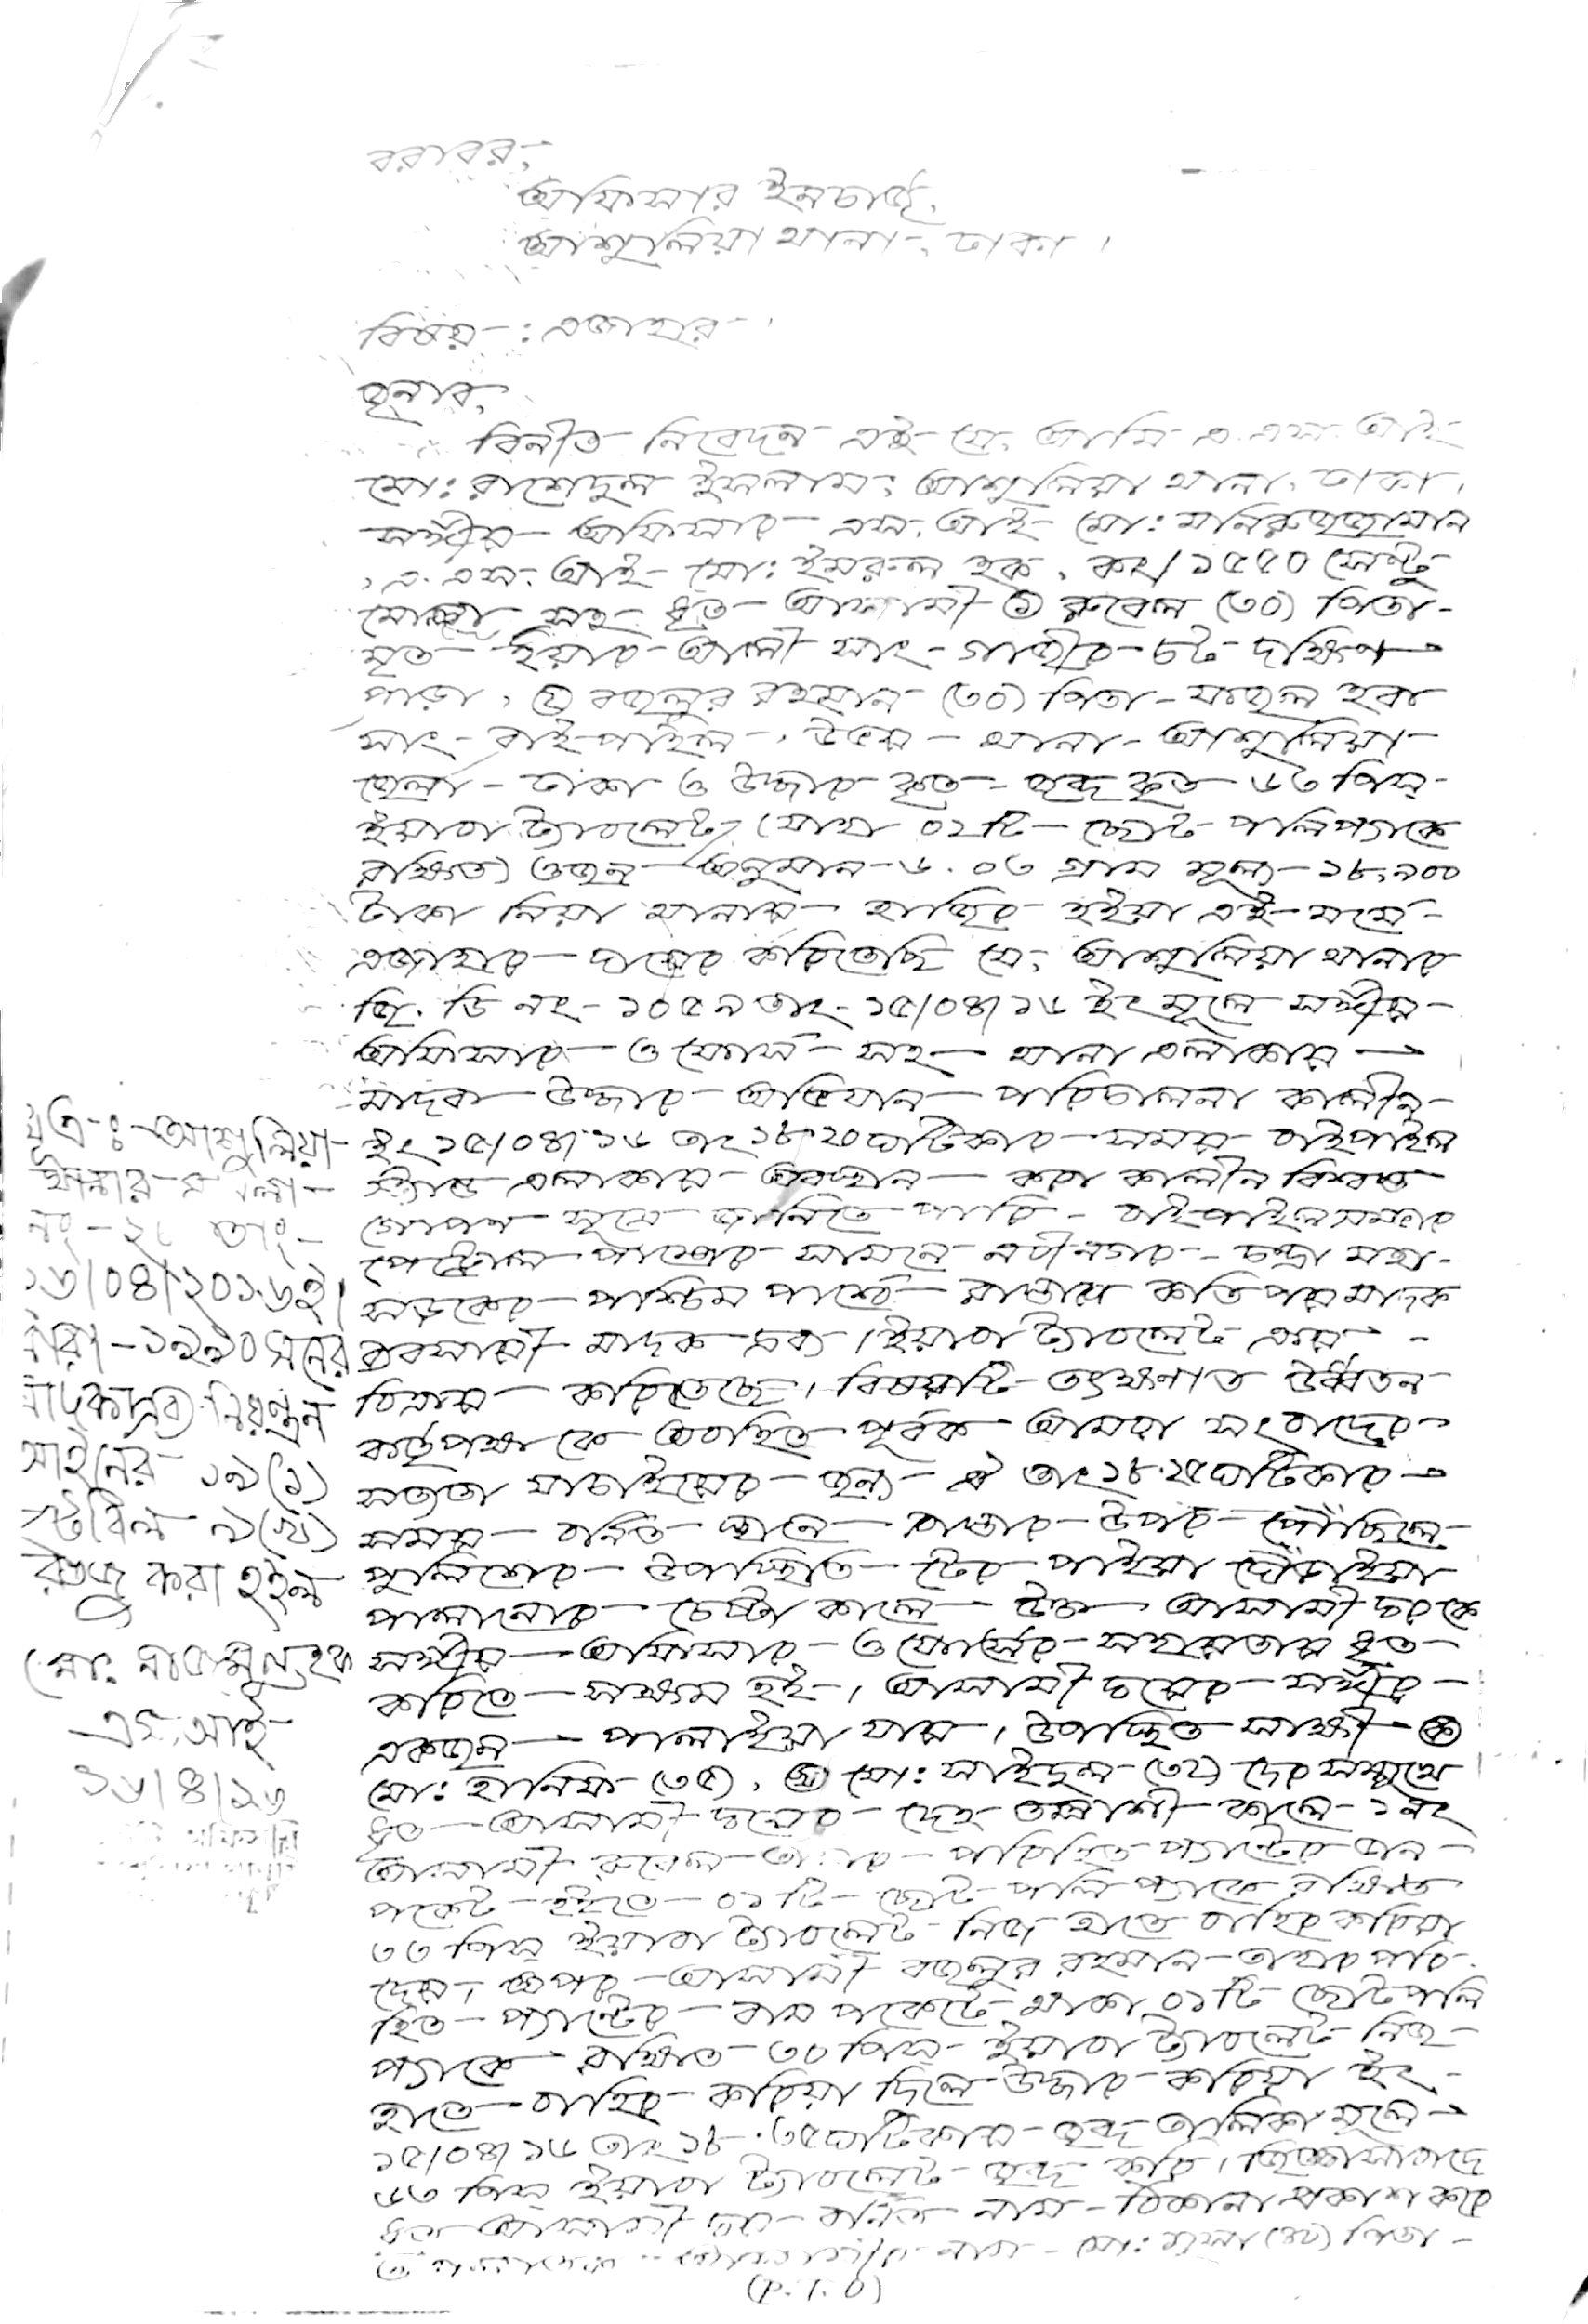 Savar ashulia mamla pic 1 18.04.16